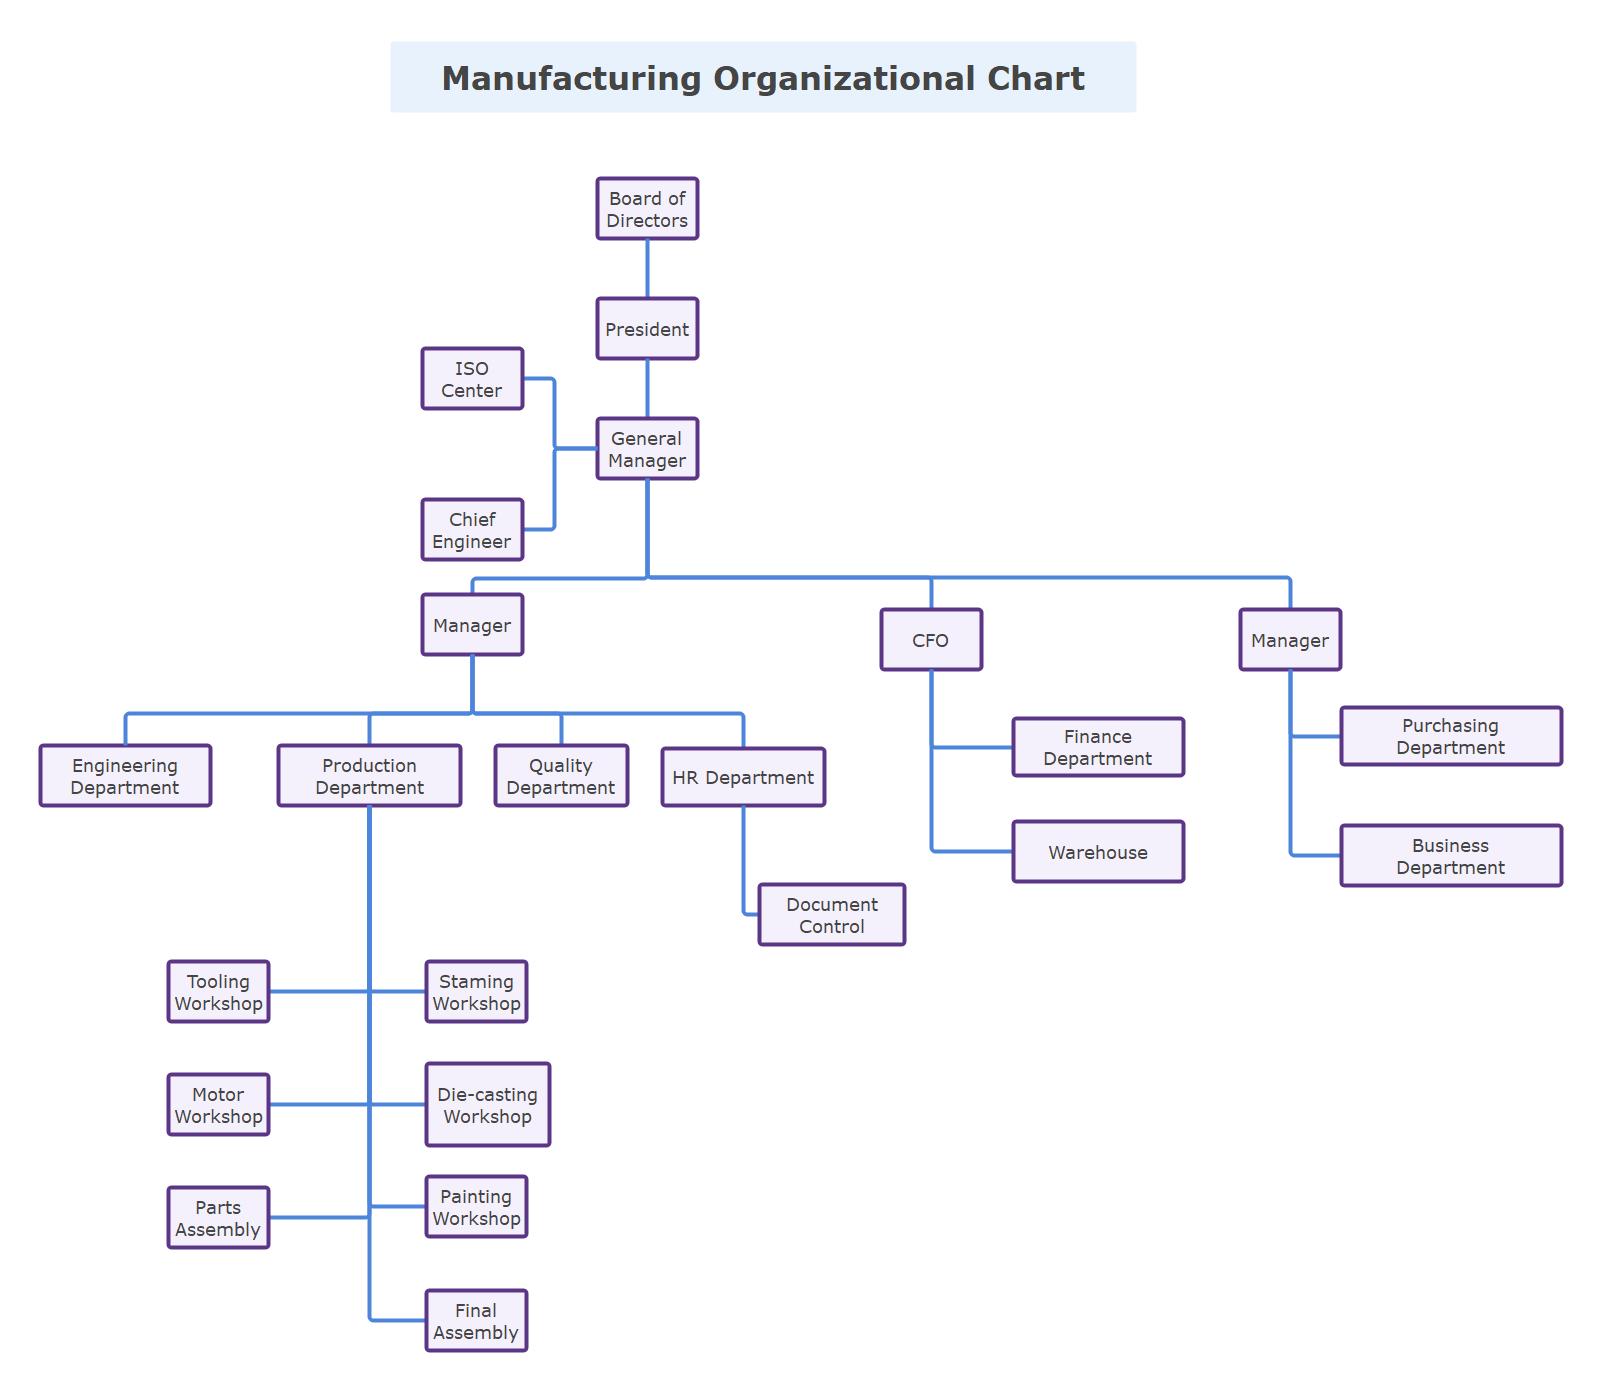 Manufacturing Organizational Chart Template